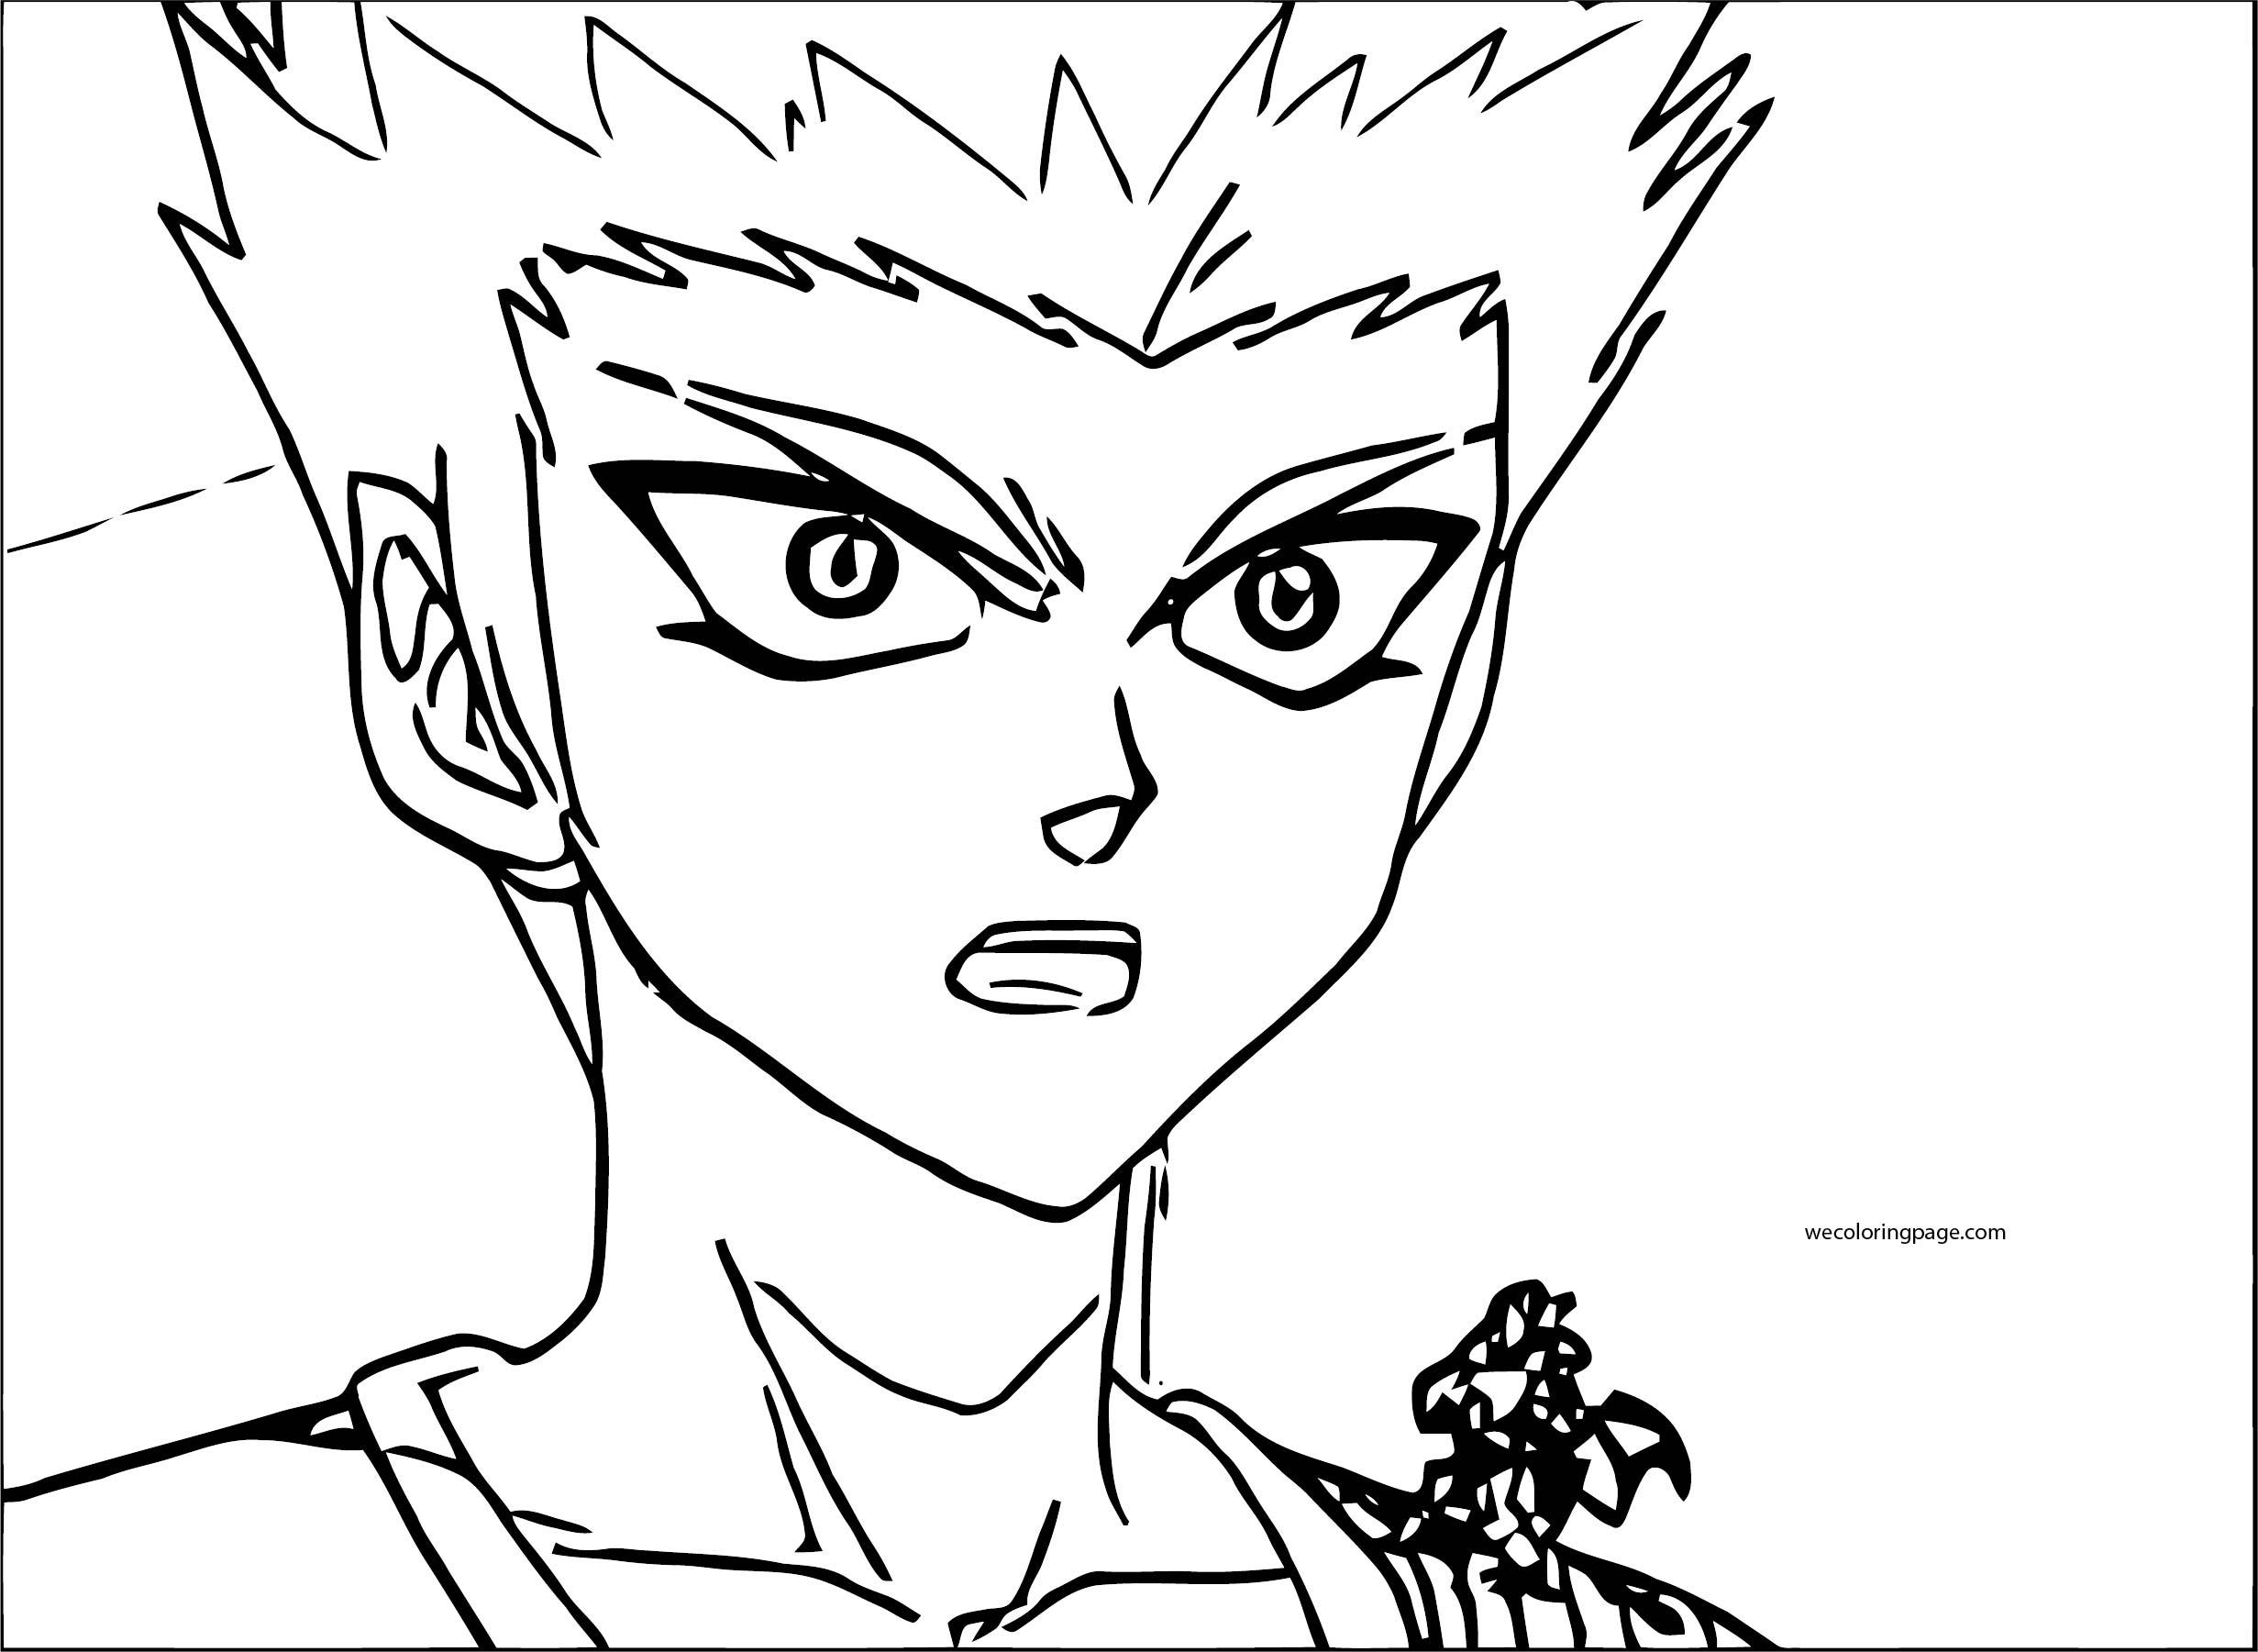 Bakugan Gundalian Invaders Episode Coloring Page